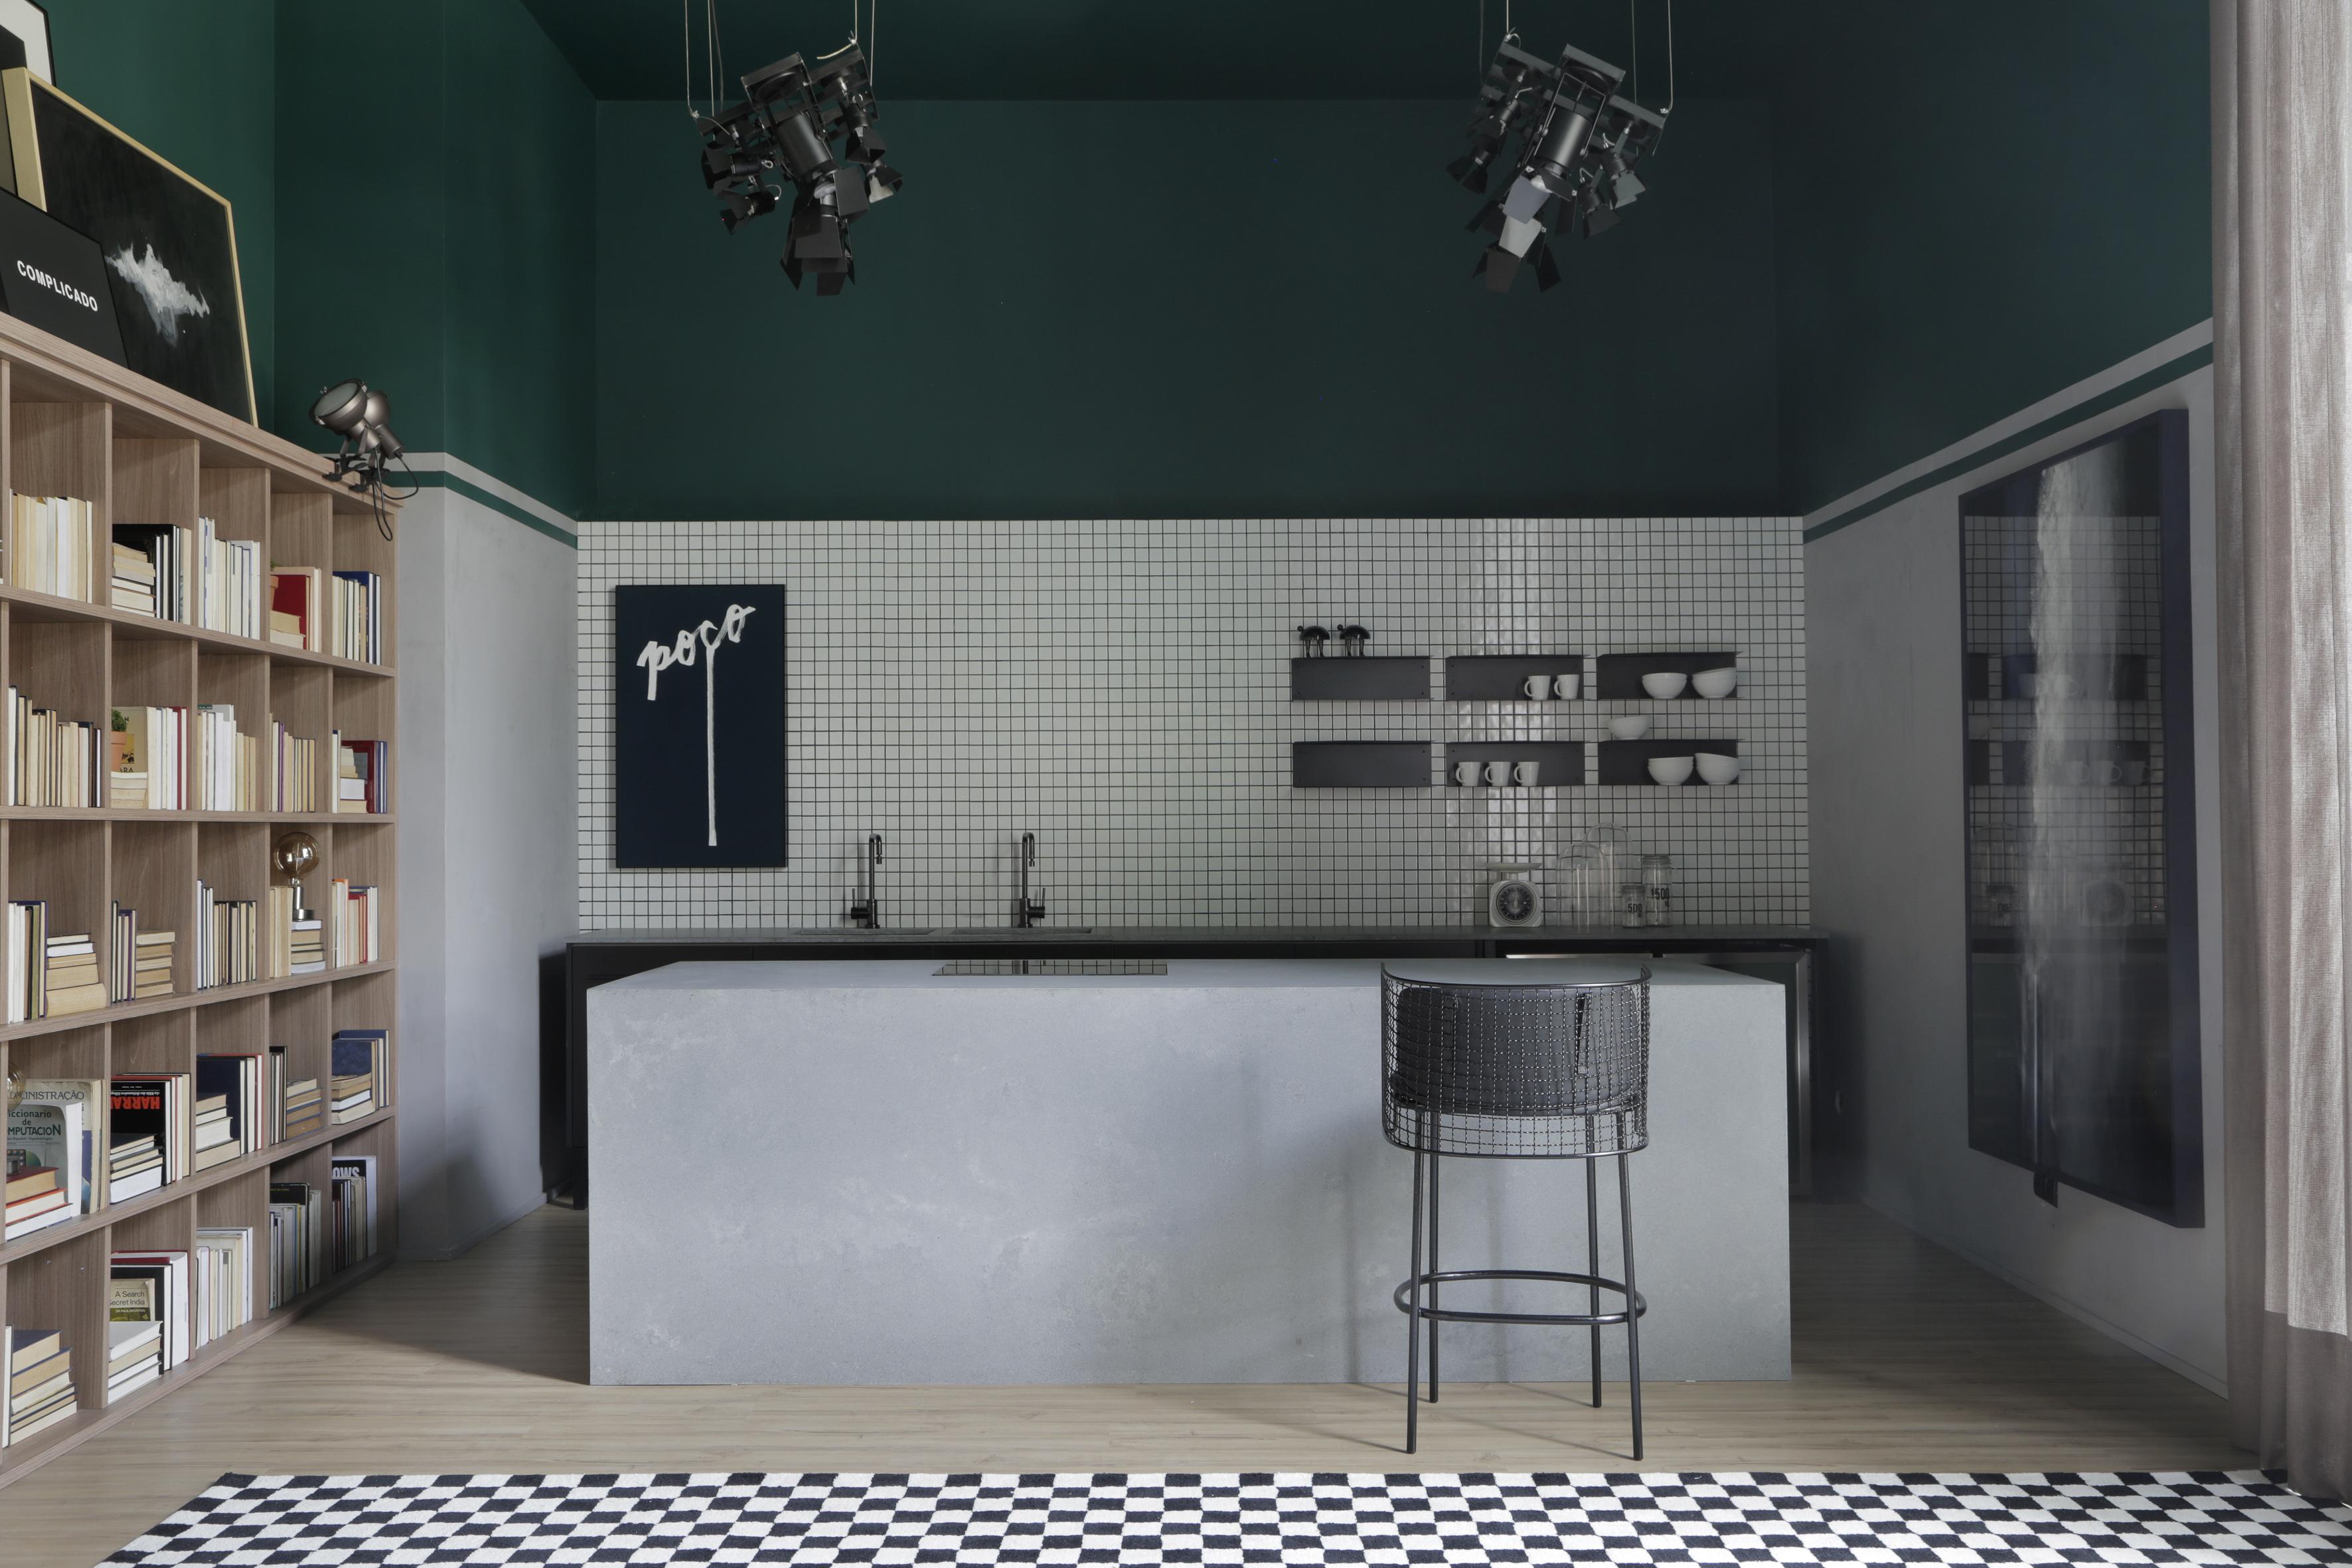 casa berilo leroy merlin studio ro+ca casacor são paulo 2019